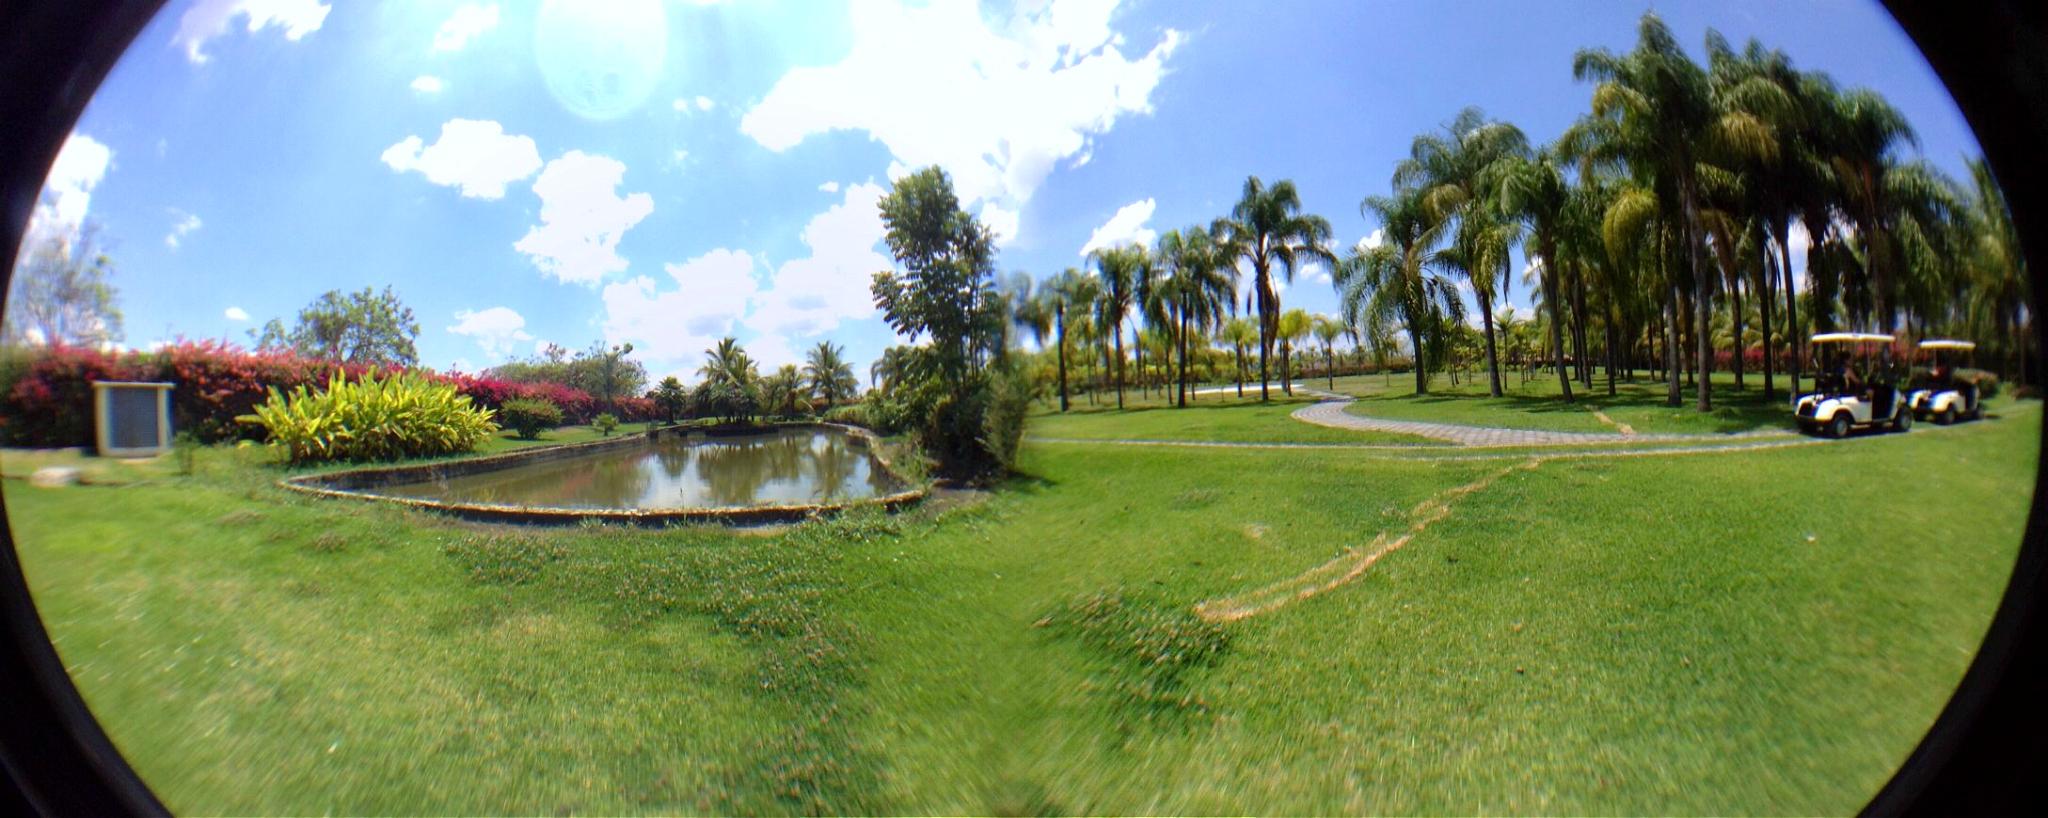 Lago villa toscana 9.jpg